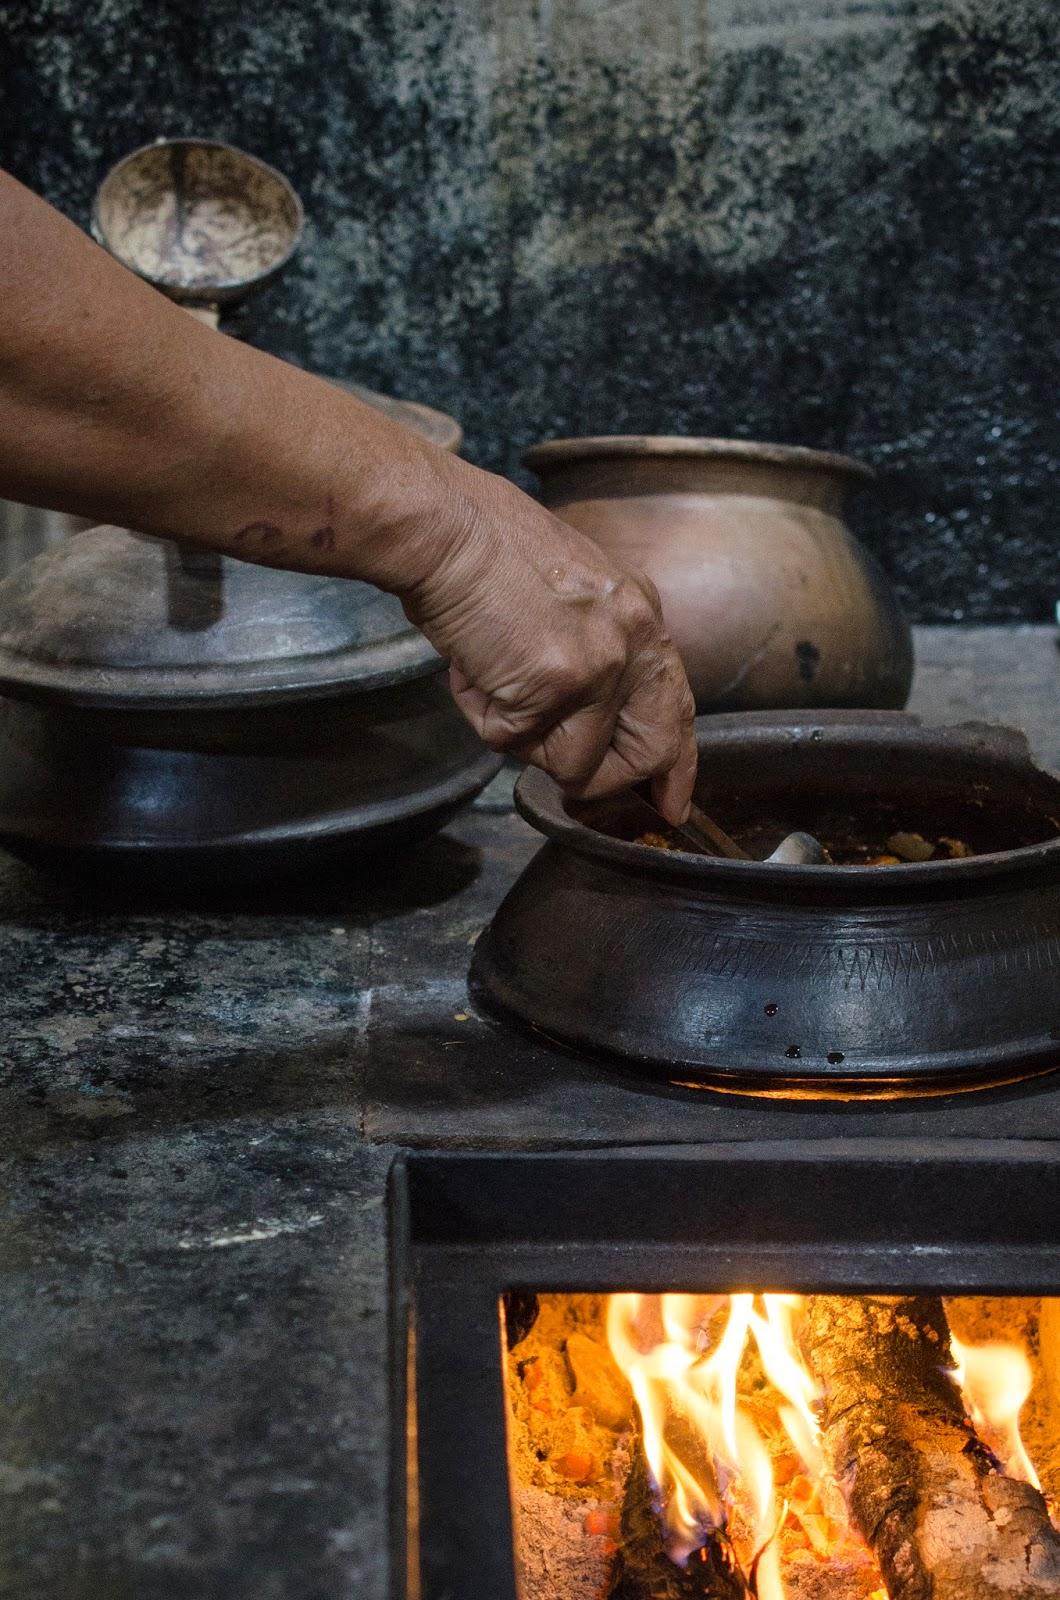 Tales from India - Memories of Mai - Making Boti